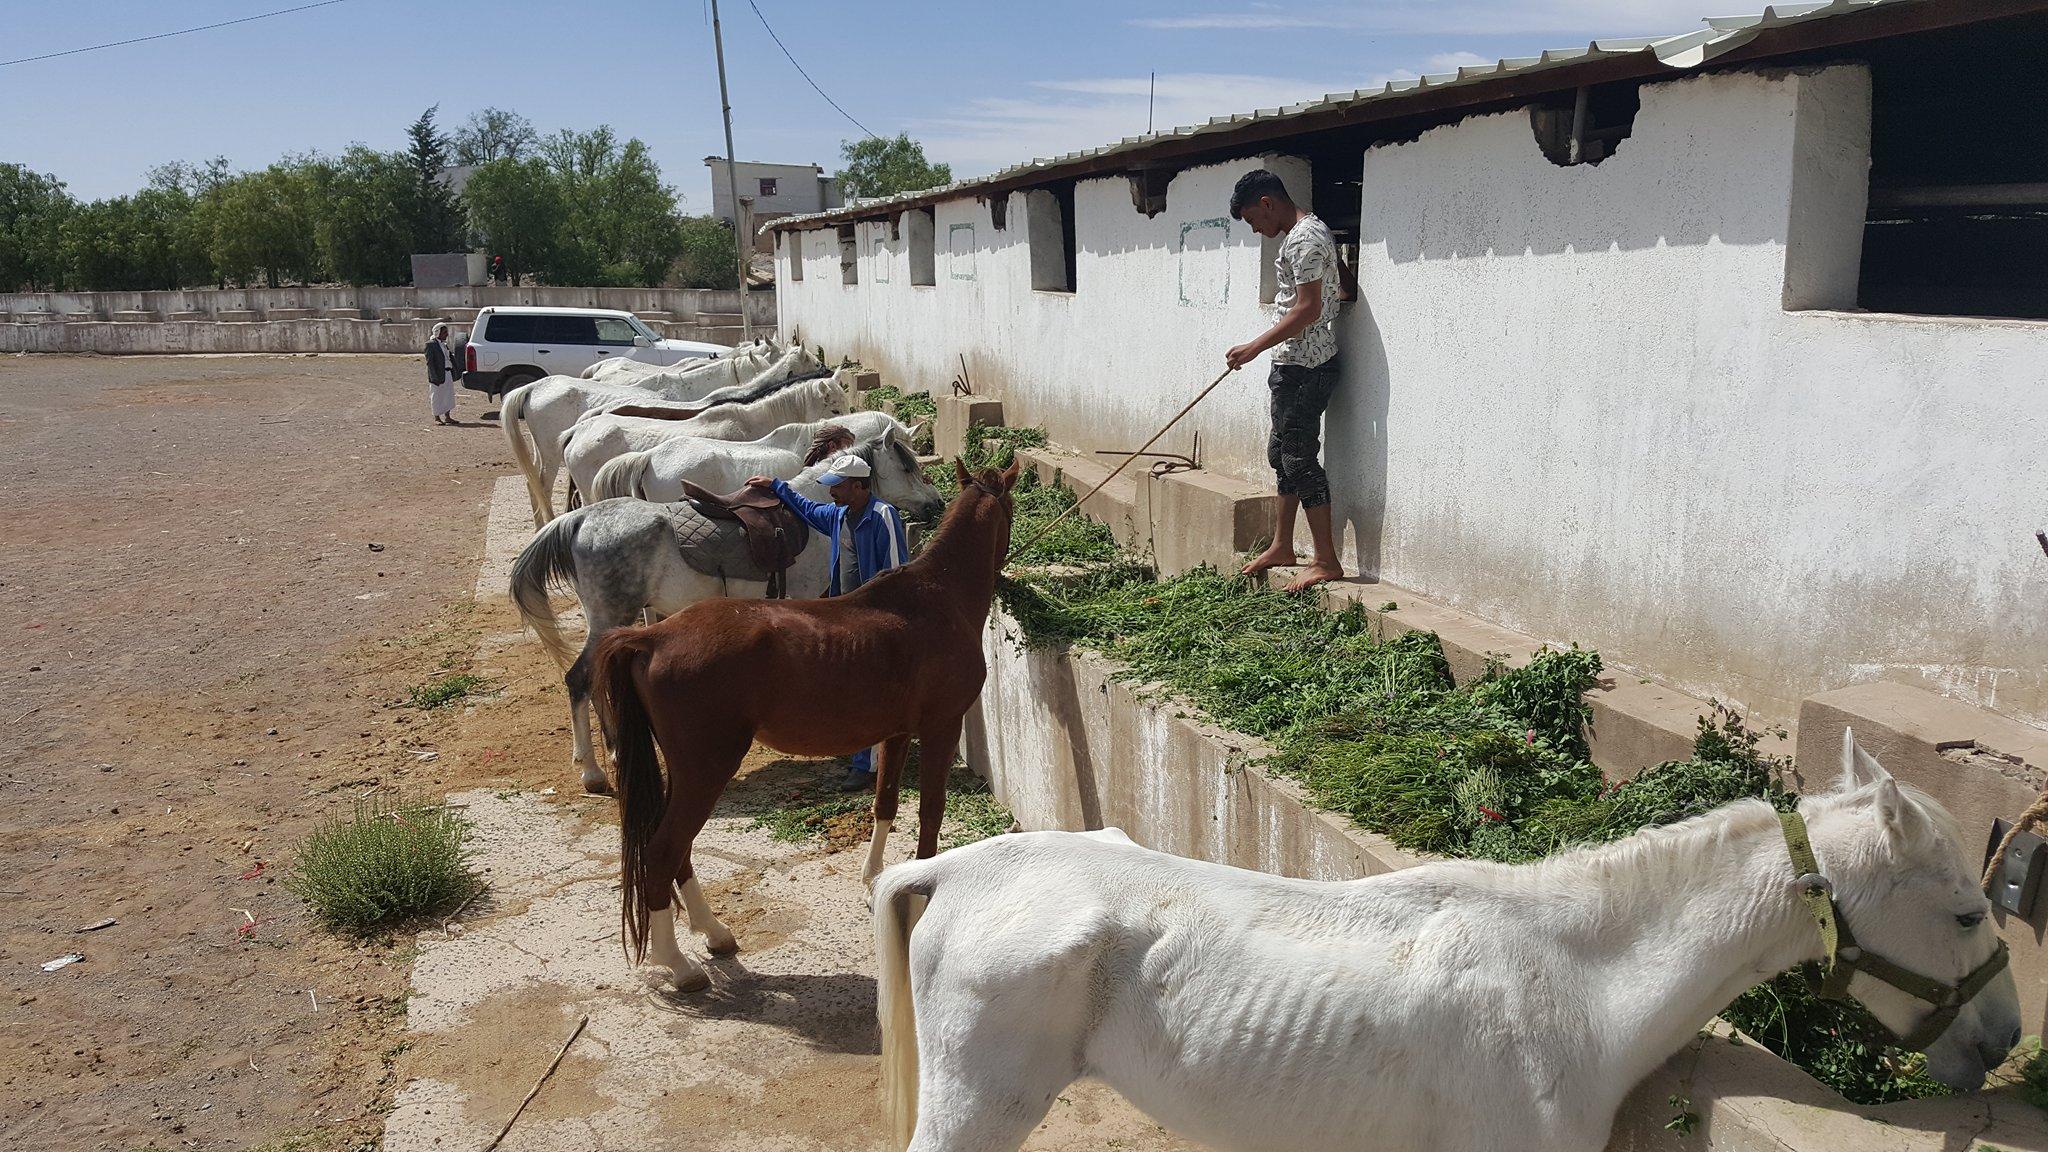 dhamar q'rab green food horse from OWAP AR  helall 16 NOV 2018 yemen stable  rescue.jpg